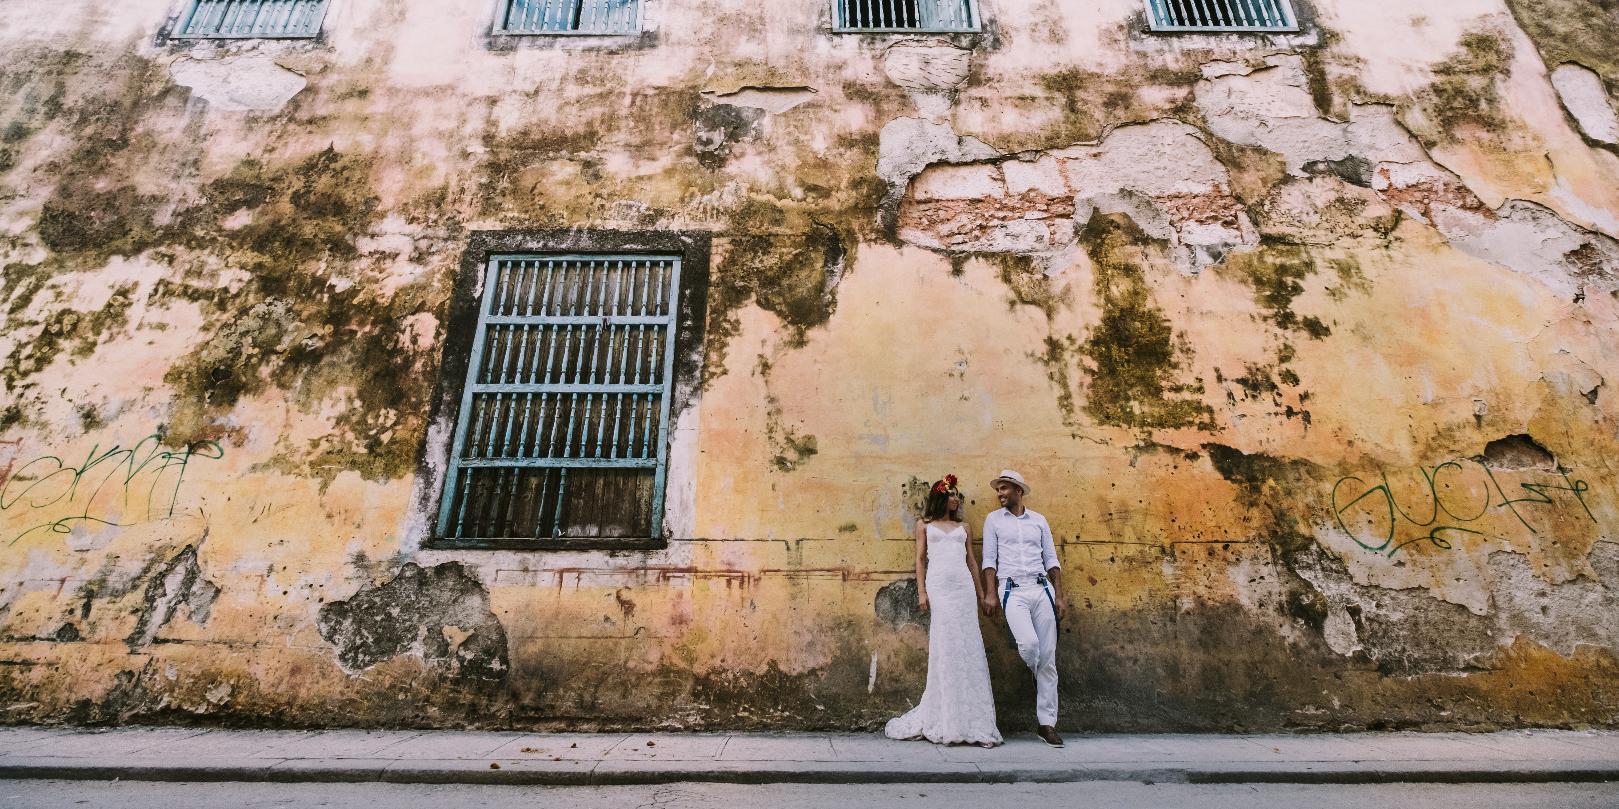 bodas-sin-clasificar-sin-tema-cuba-28961.jpg